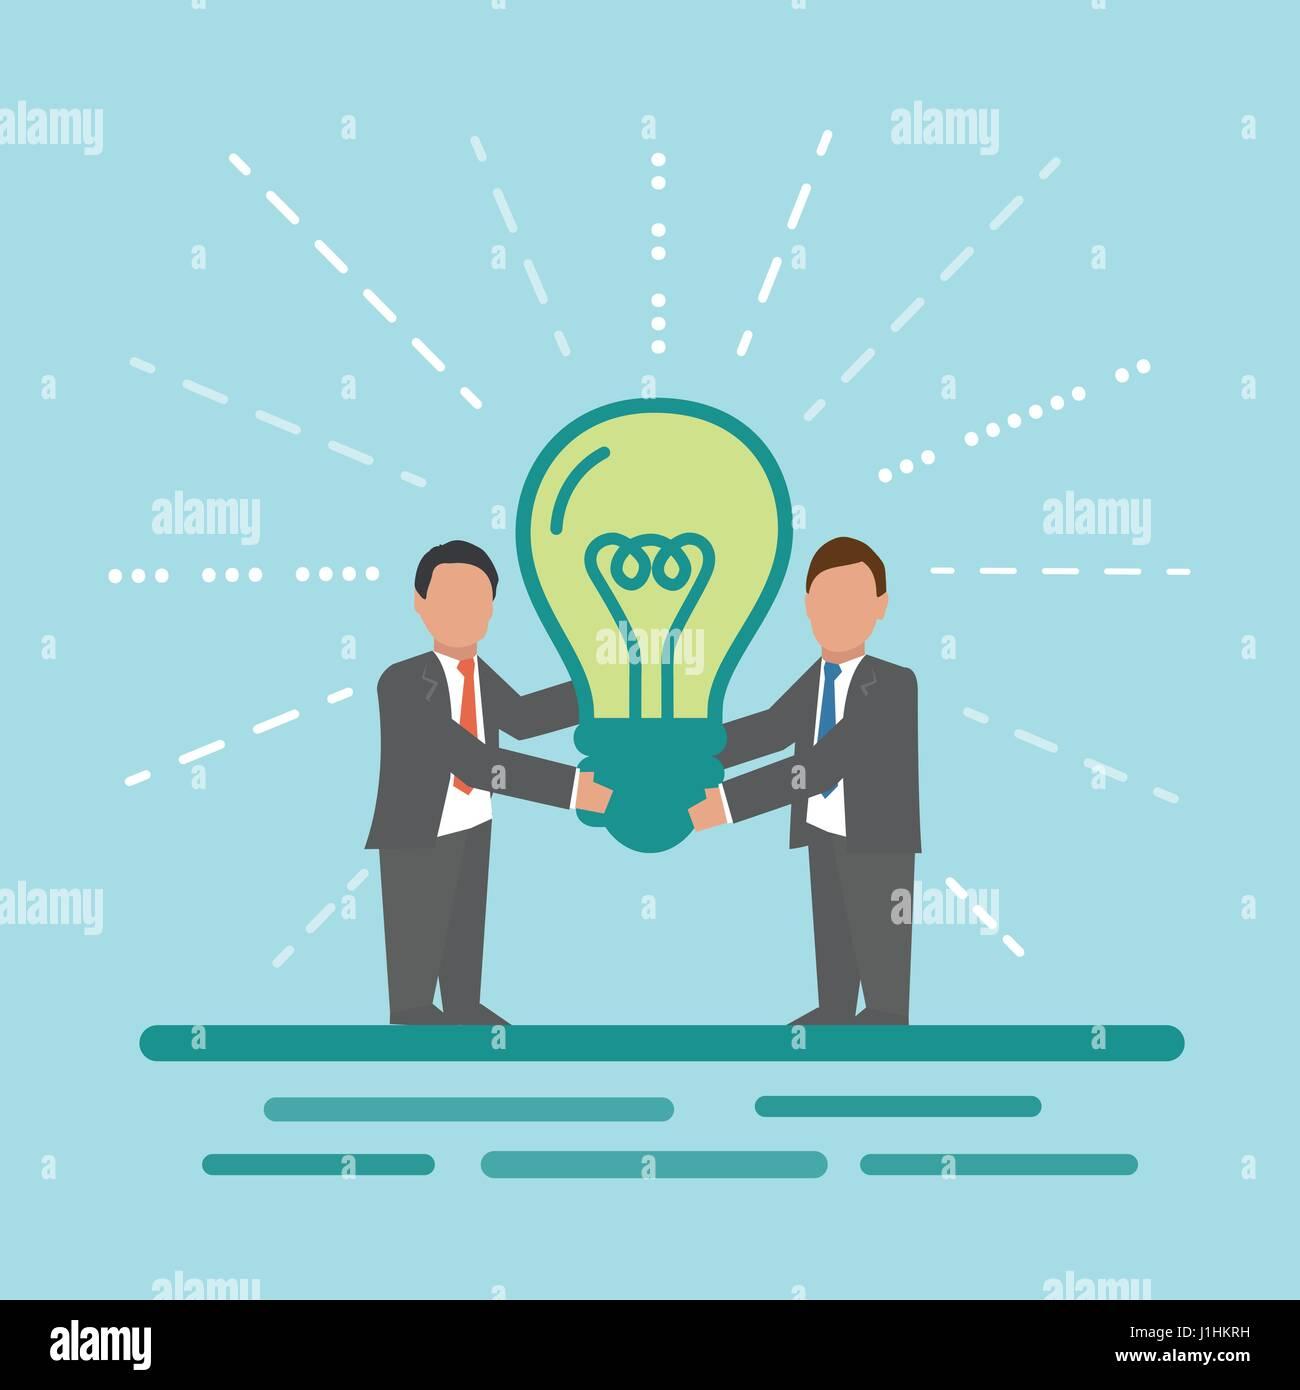 Idea. Concept business illustration. Stock Vector